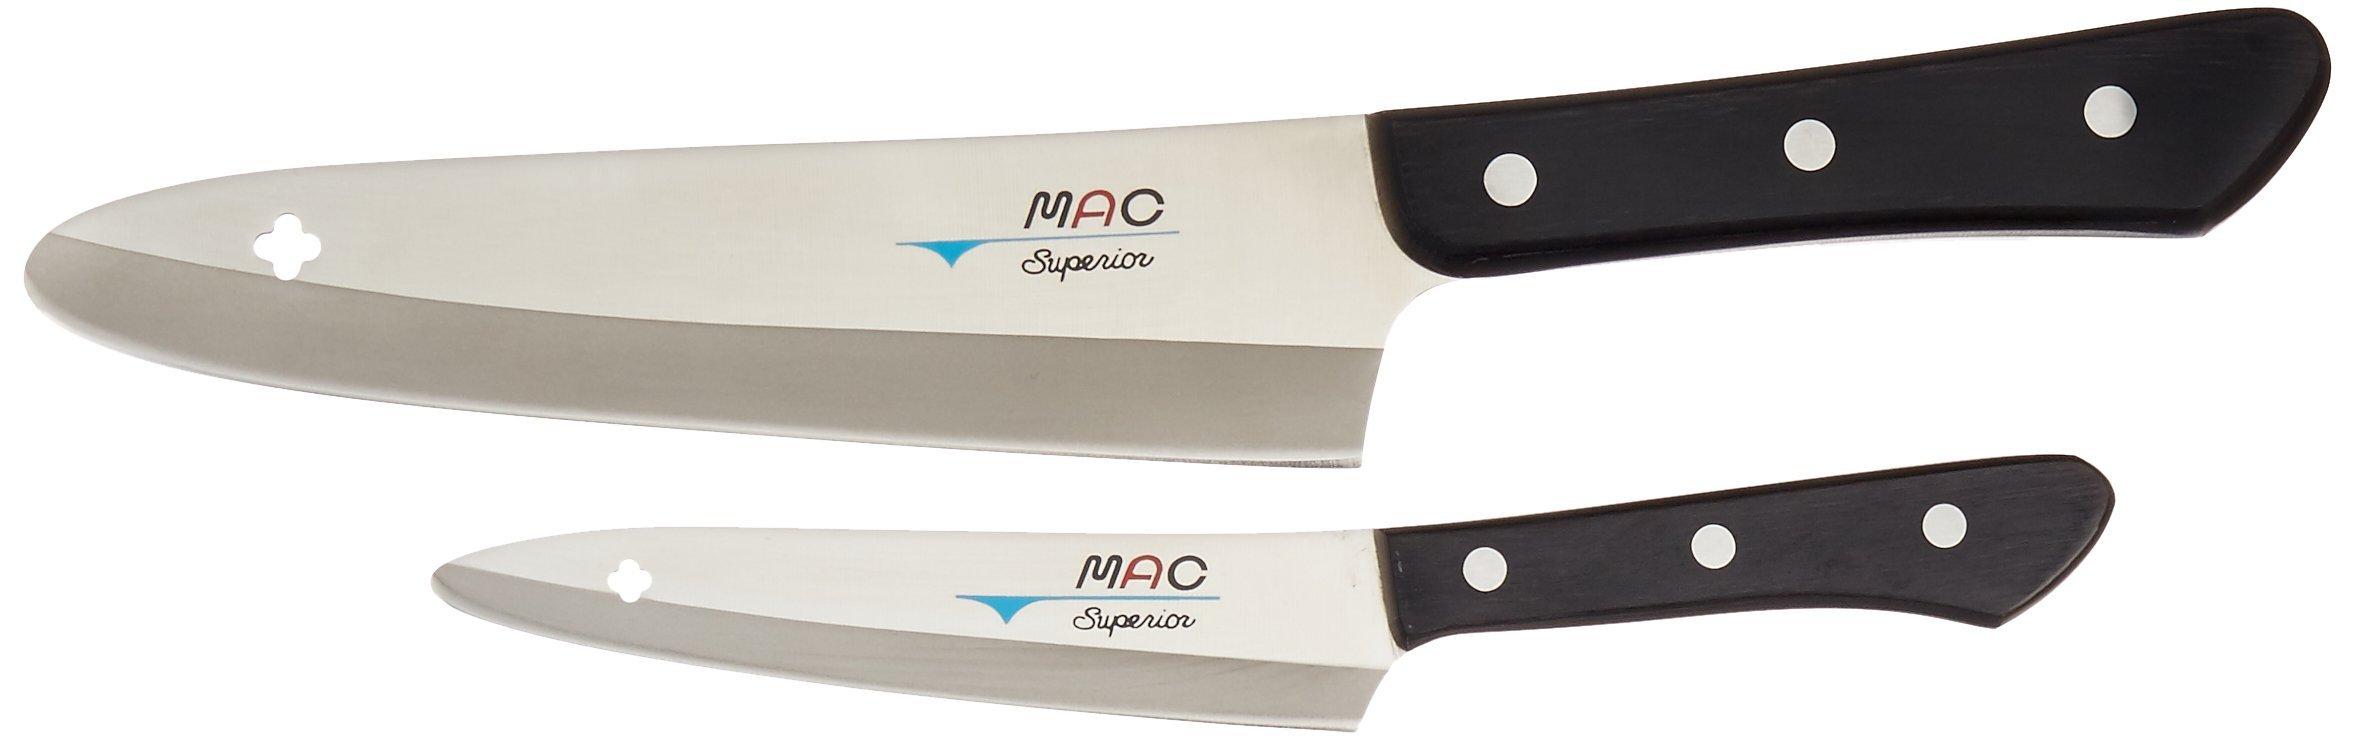 Mac Knife Superior Starter Knife Set, Set of 2 by Mac Knife (Image #1)